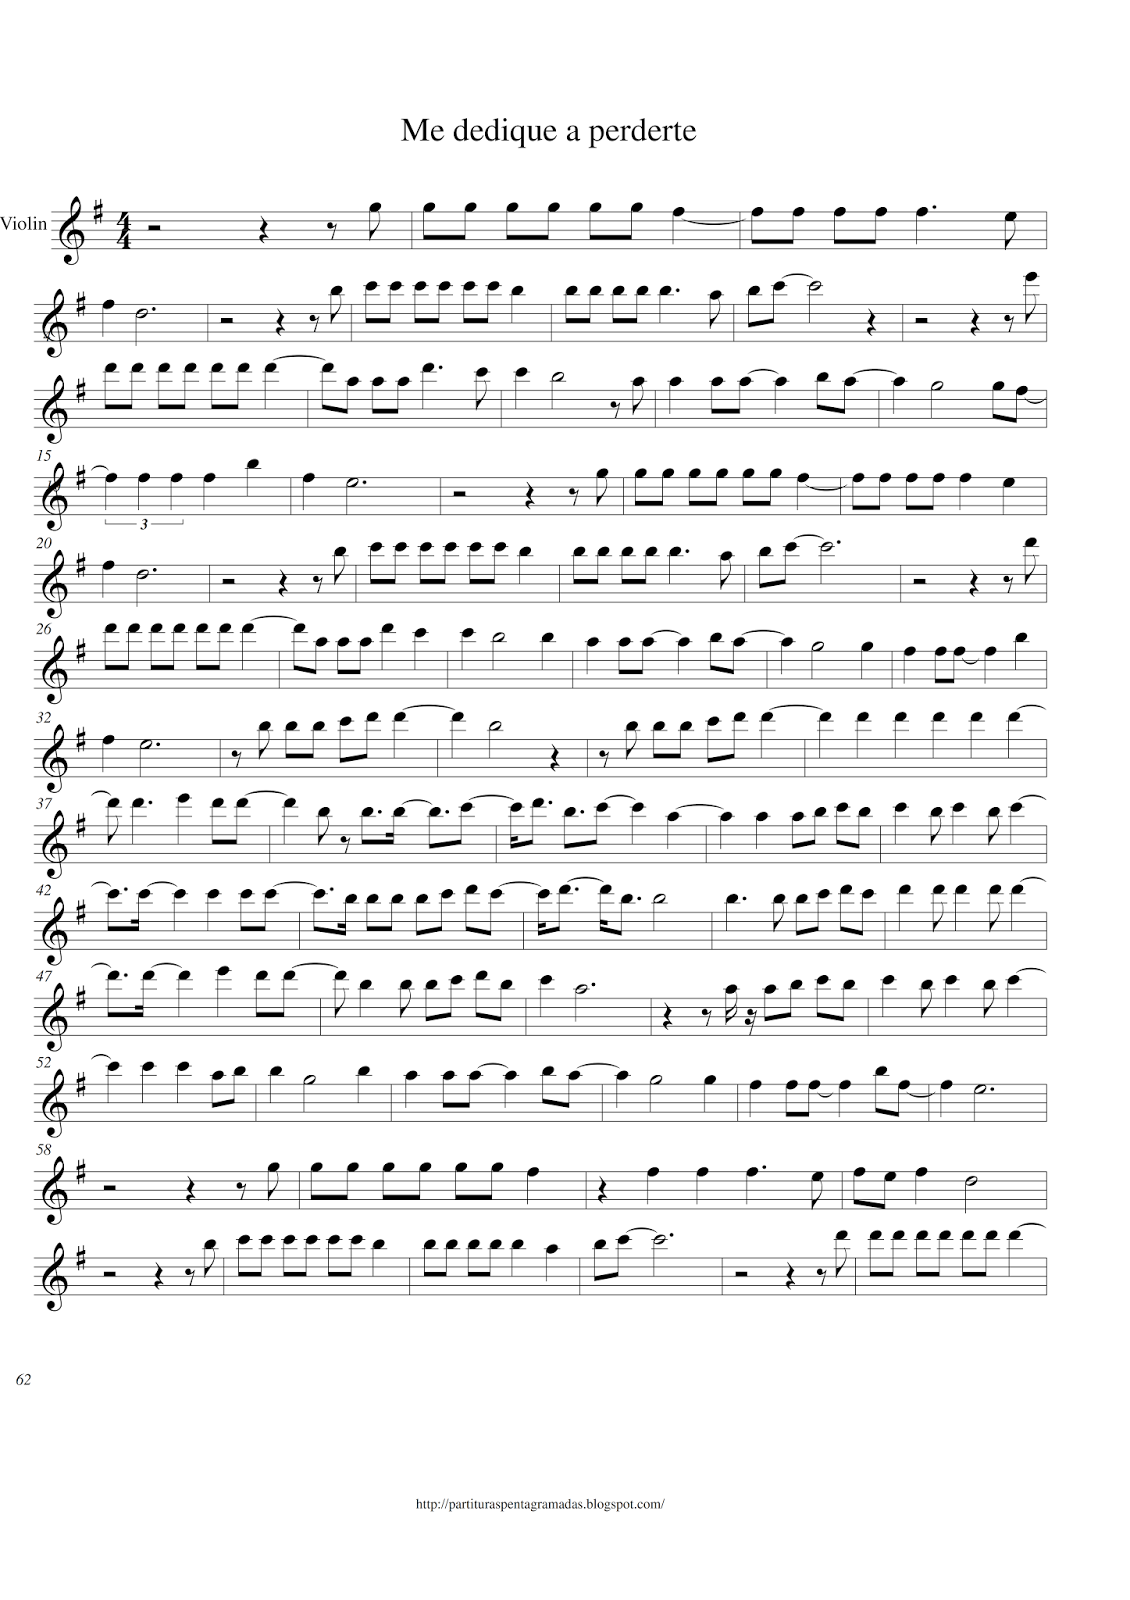 Partituras Pentagramadas Partitura Me Dedique A Perderte Alejandro Fernández Partituras Violines Alejandro Fernandez